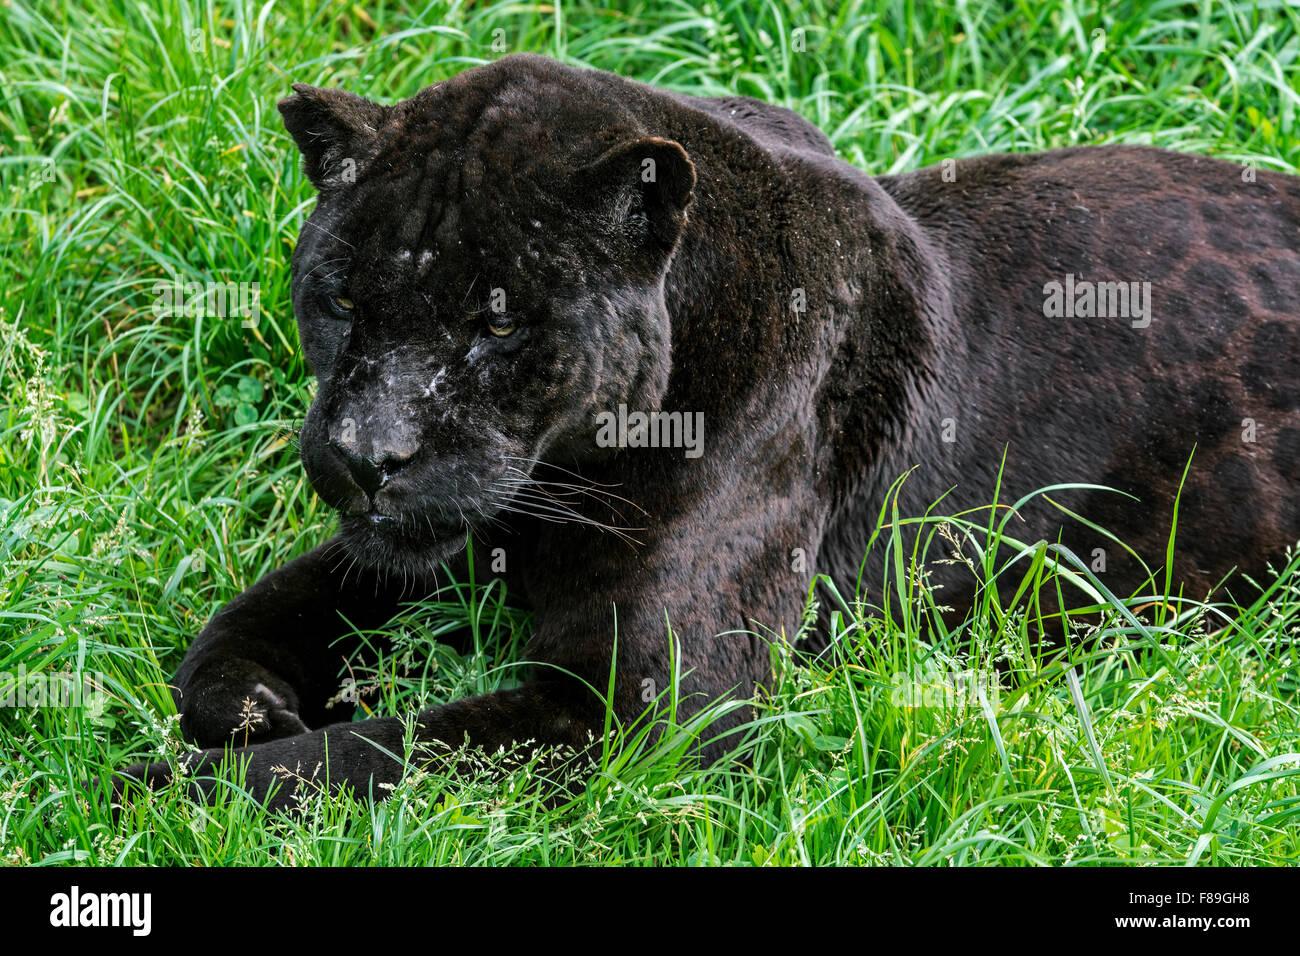 Close Up Portrait Of Black Panther Melanistic Jaguar